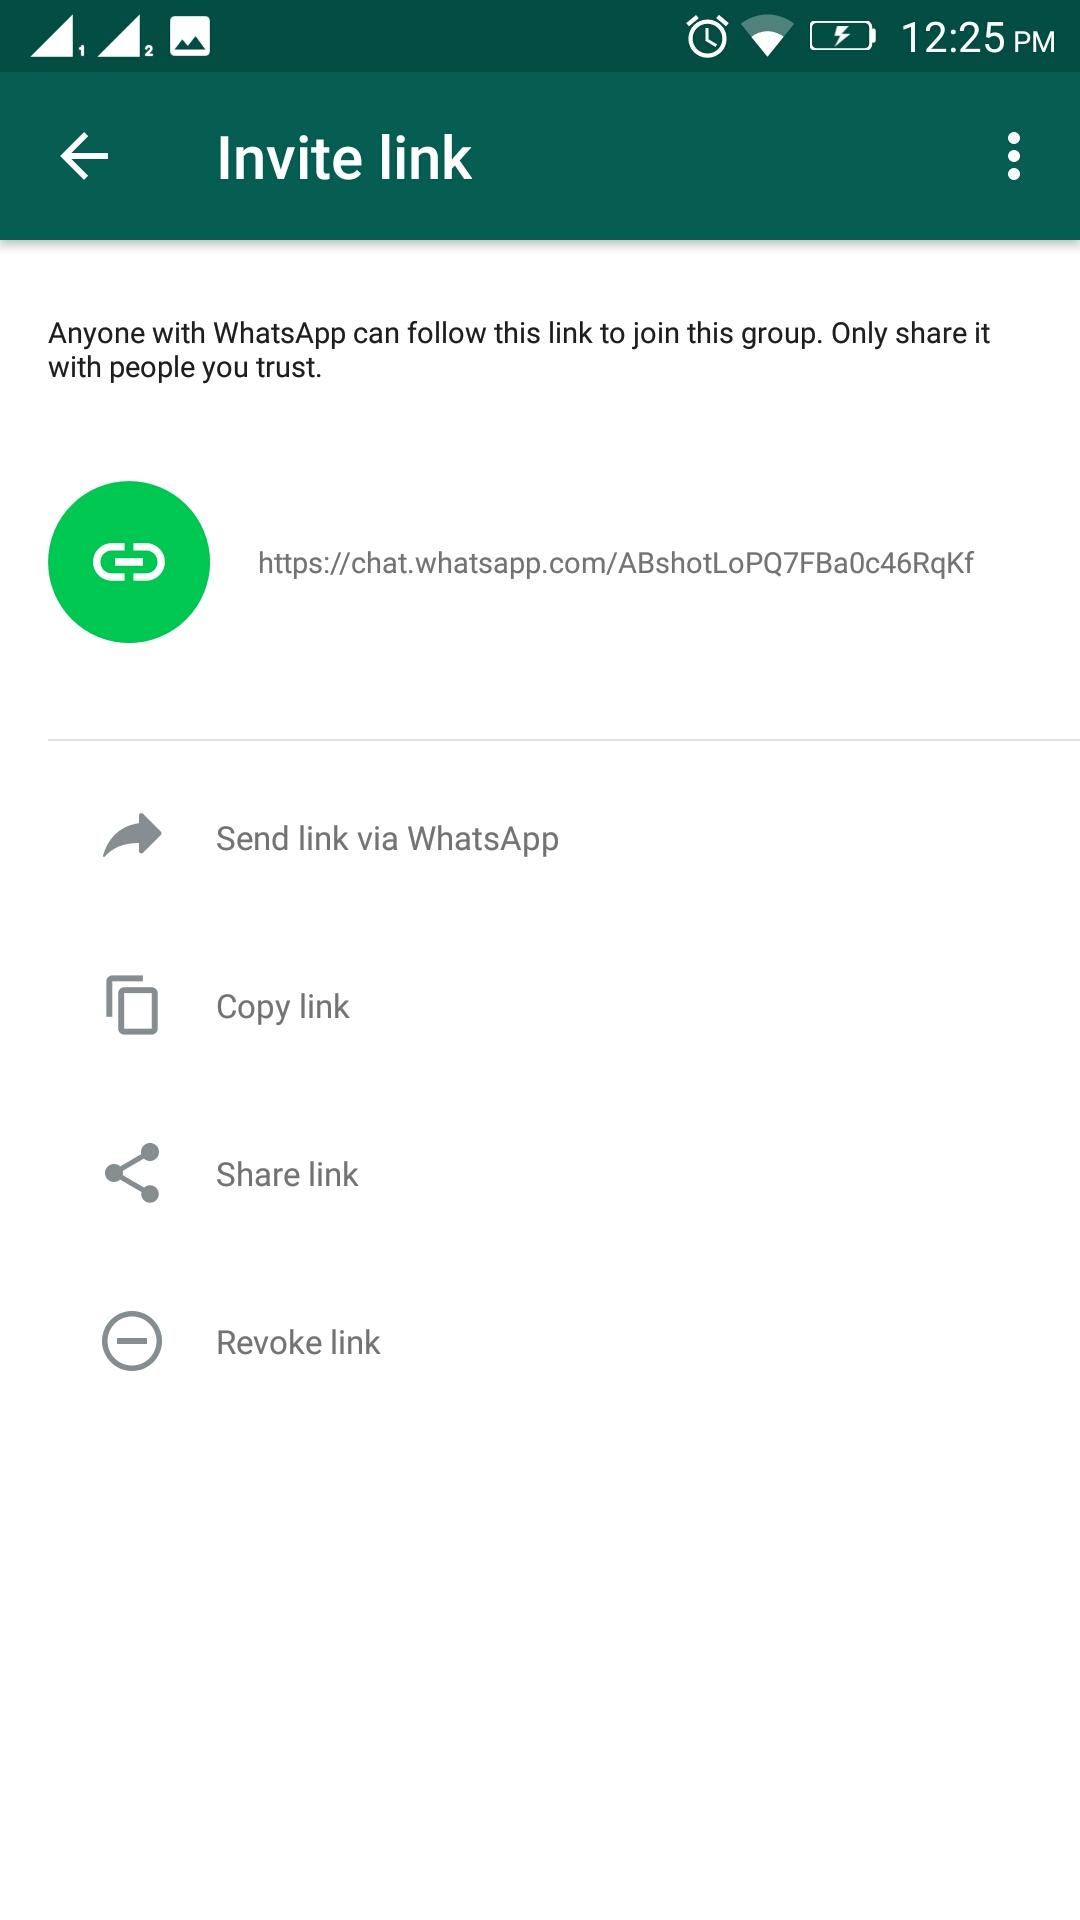 whatsapp group invite link 5